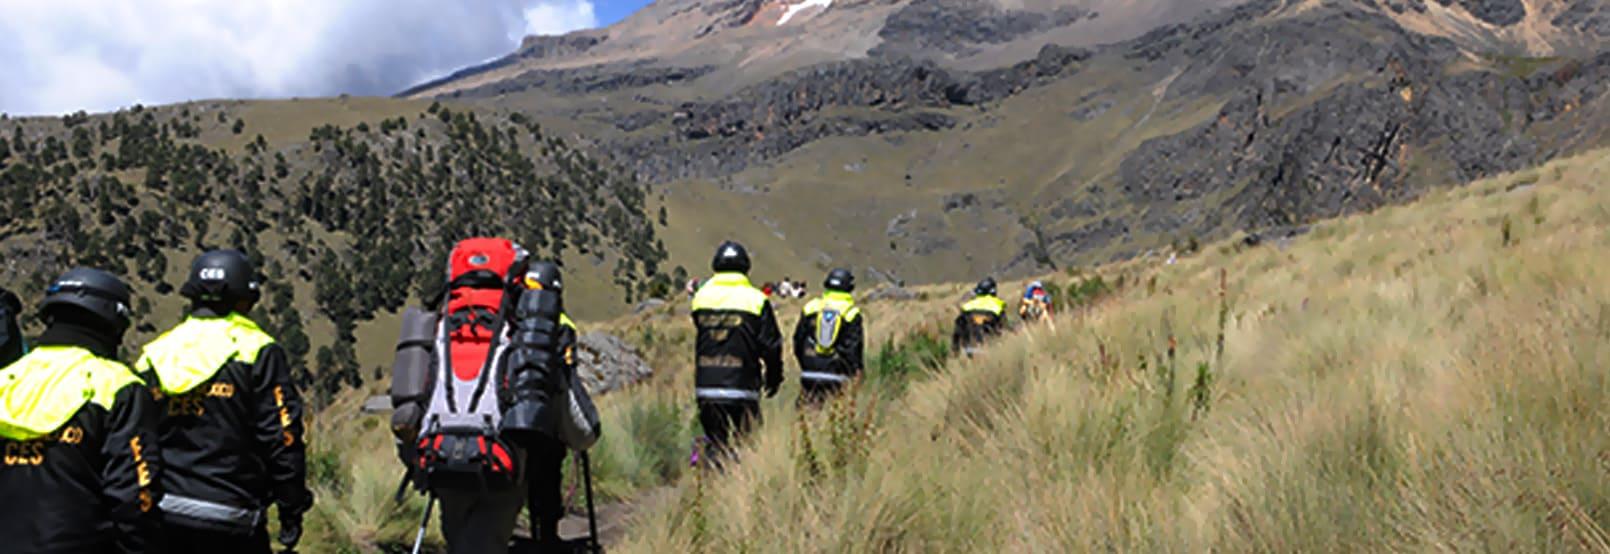 Mountaineering in Guanajuato